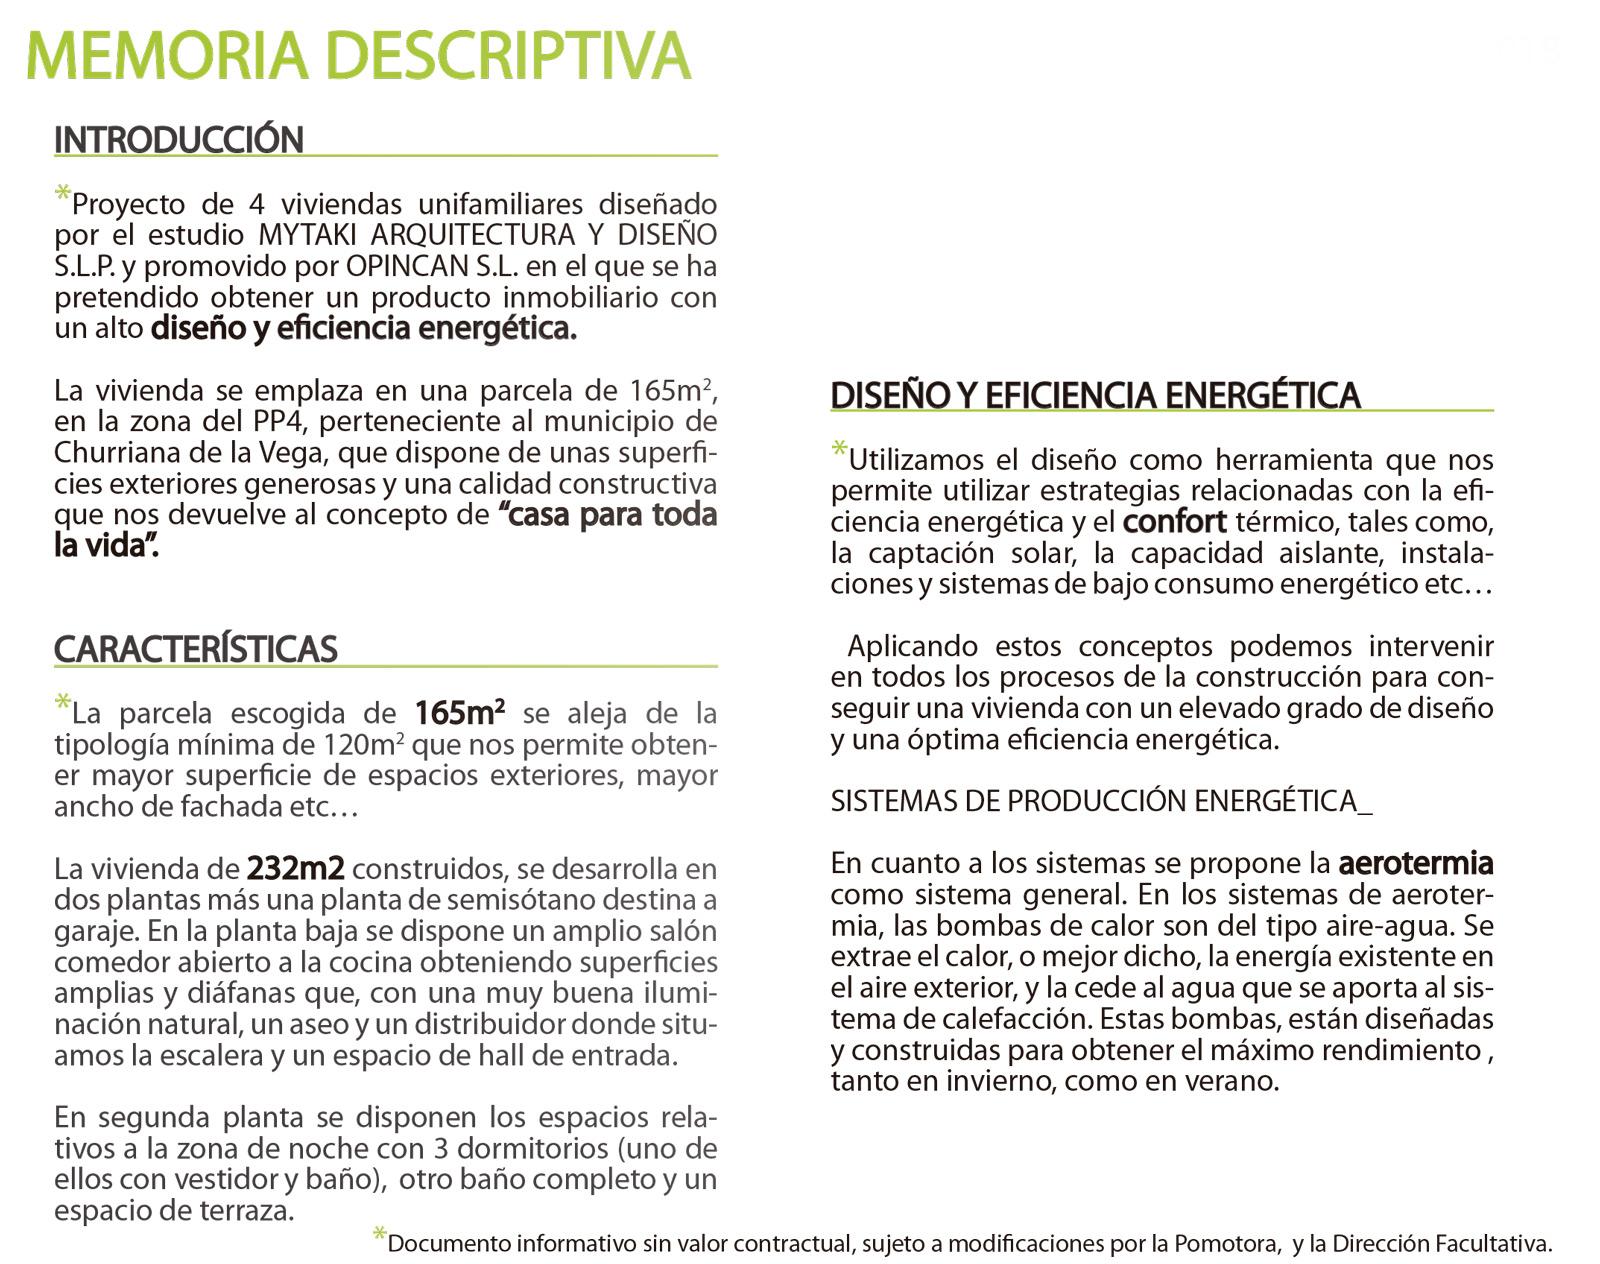 Promoción Churriana de la Vega - Opincan